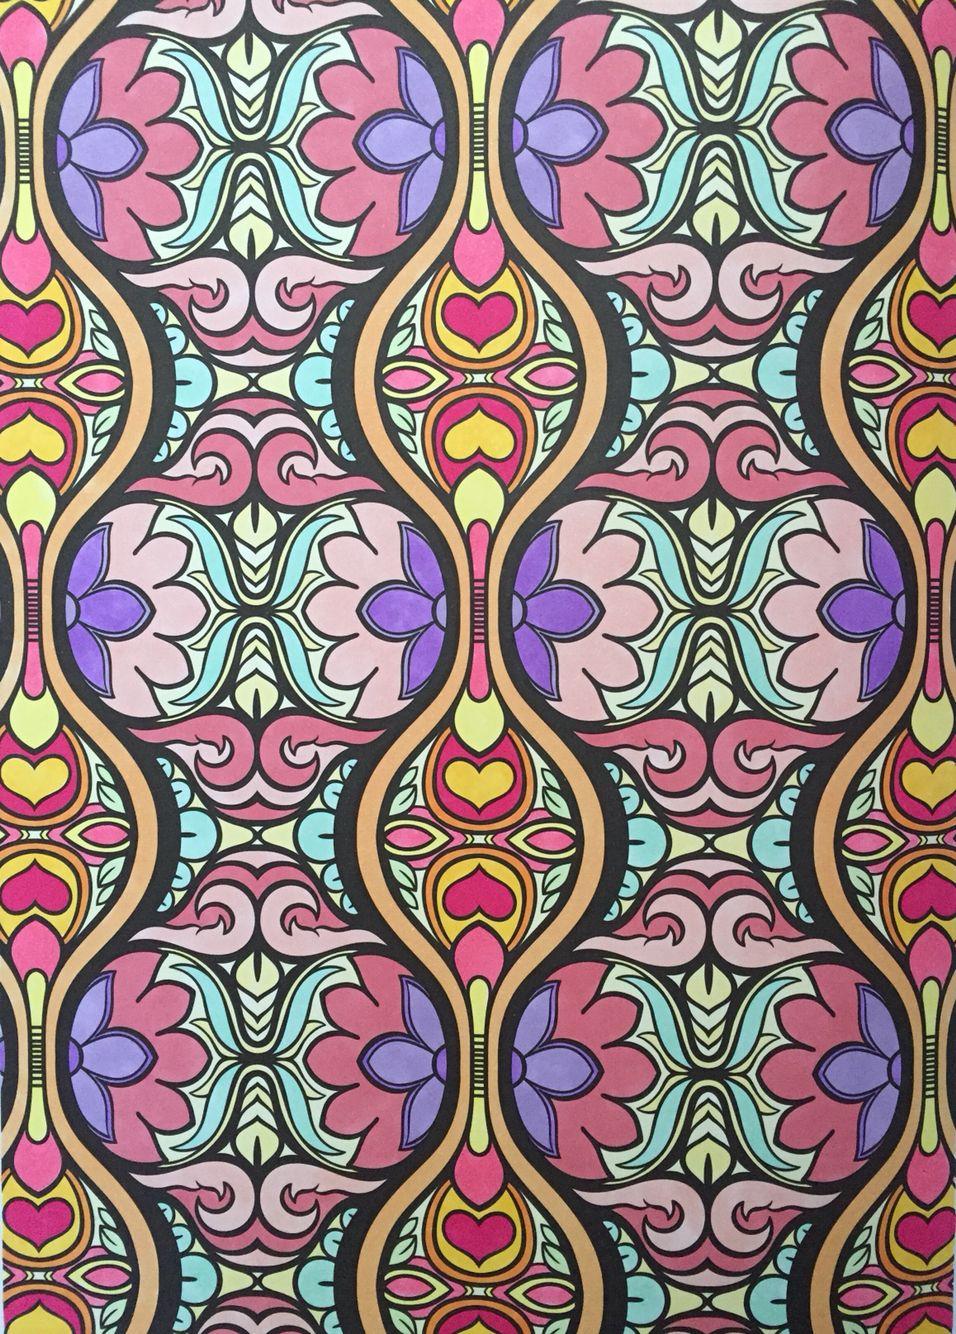 Vintage Patterns Coloring Pages. Vintage patterns  Kleurplaten ingekleurd Pinterest